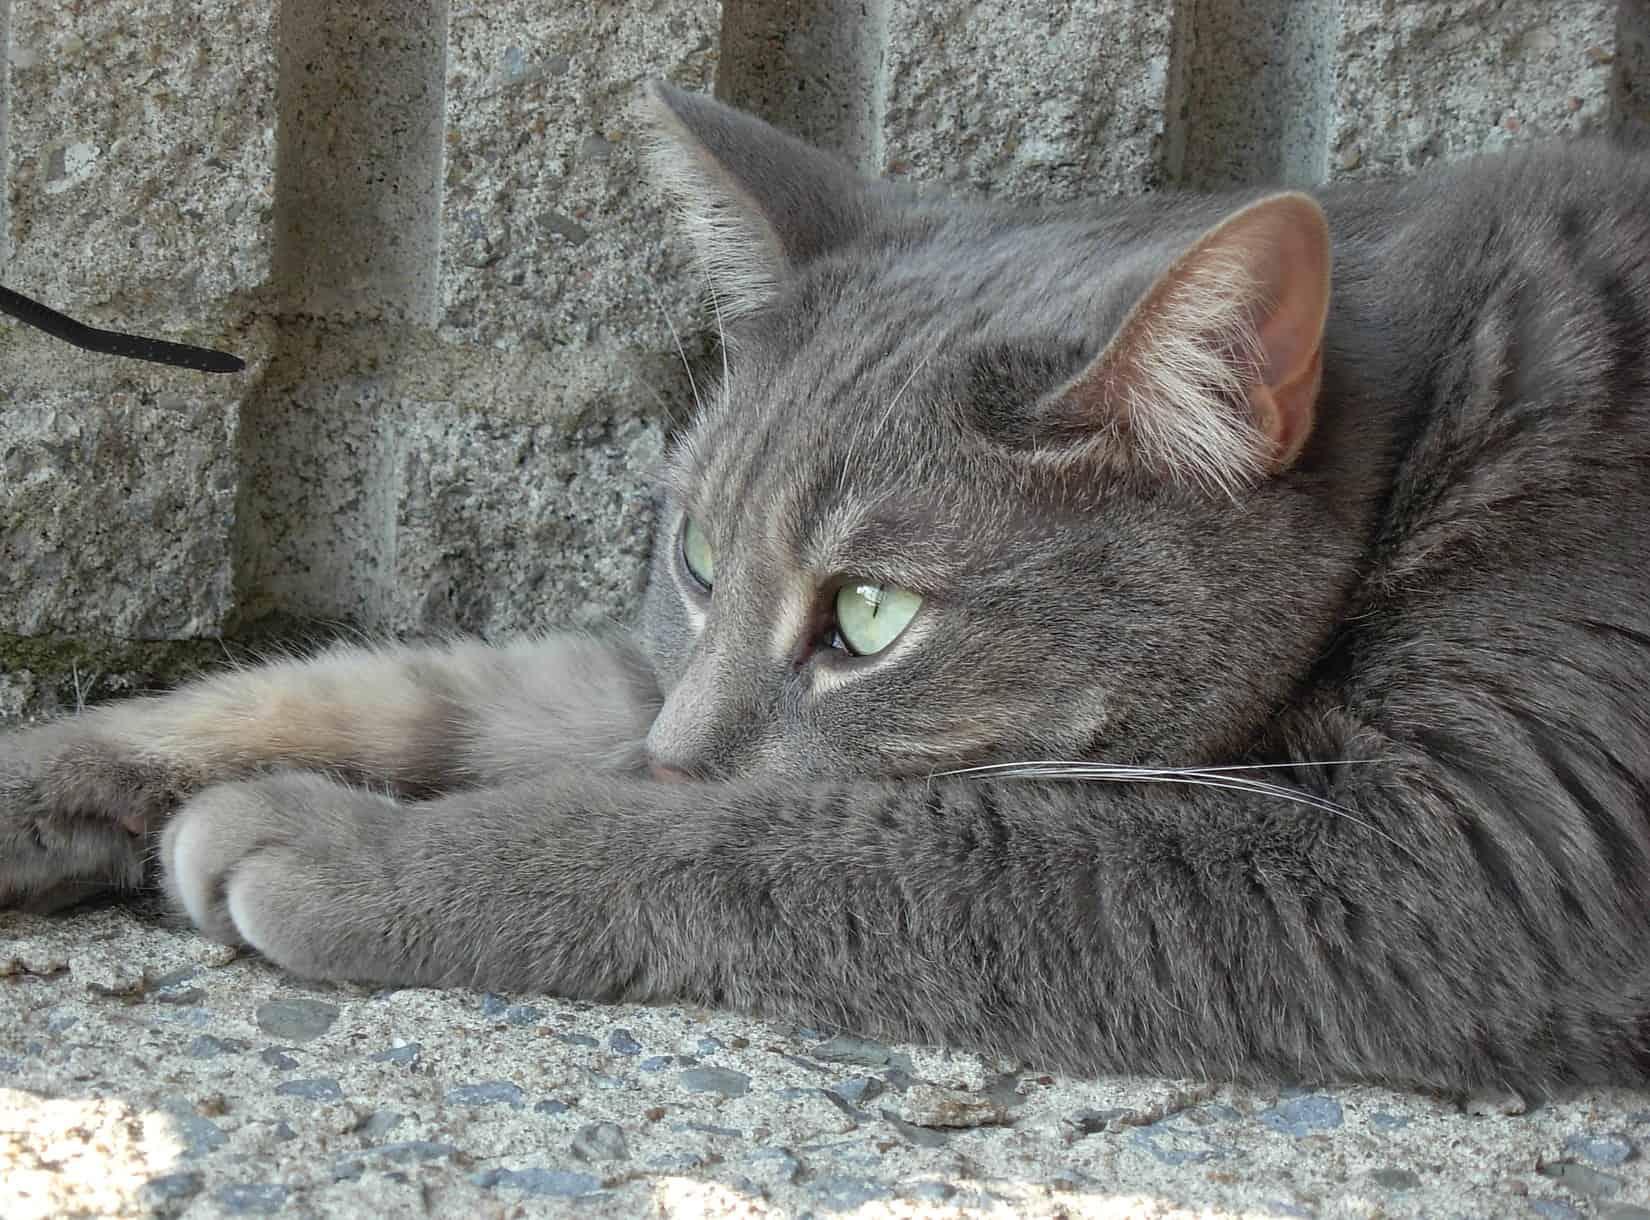 kucing merasa tidak nyaman pertanda sakit